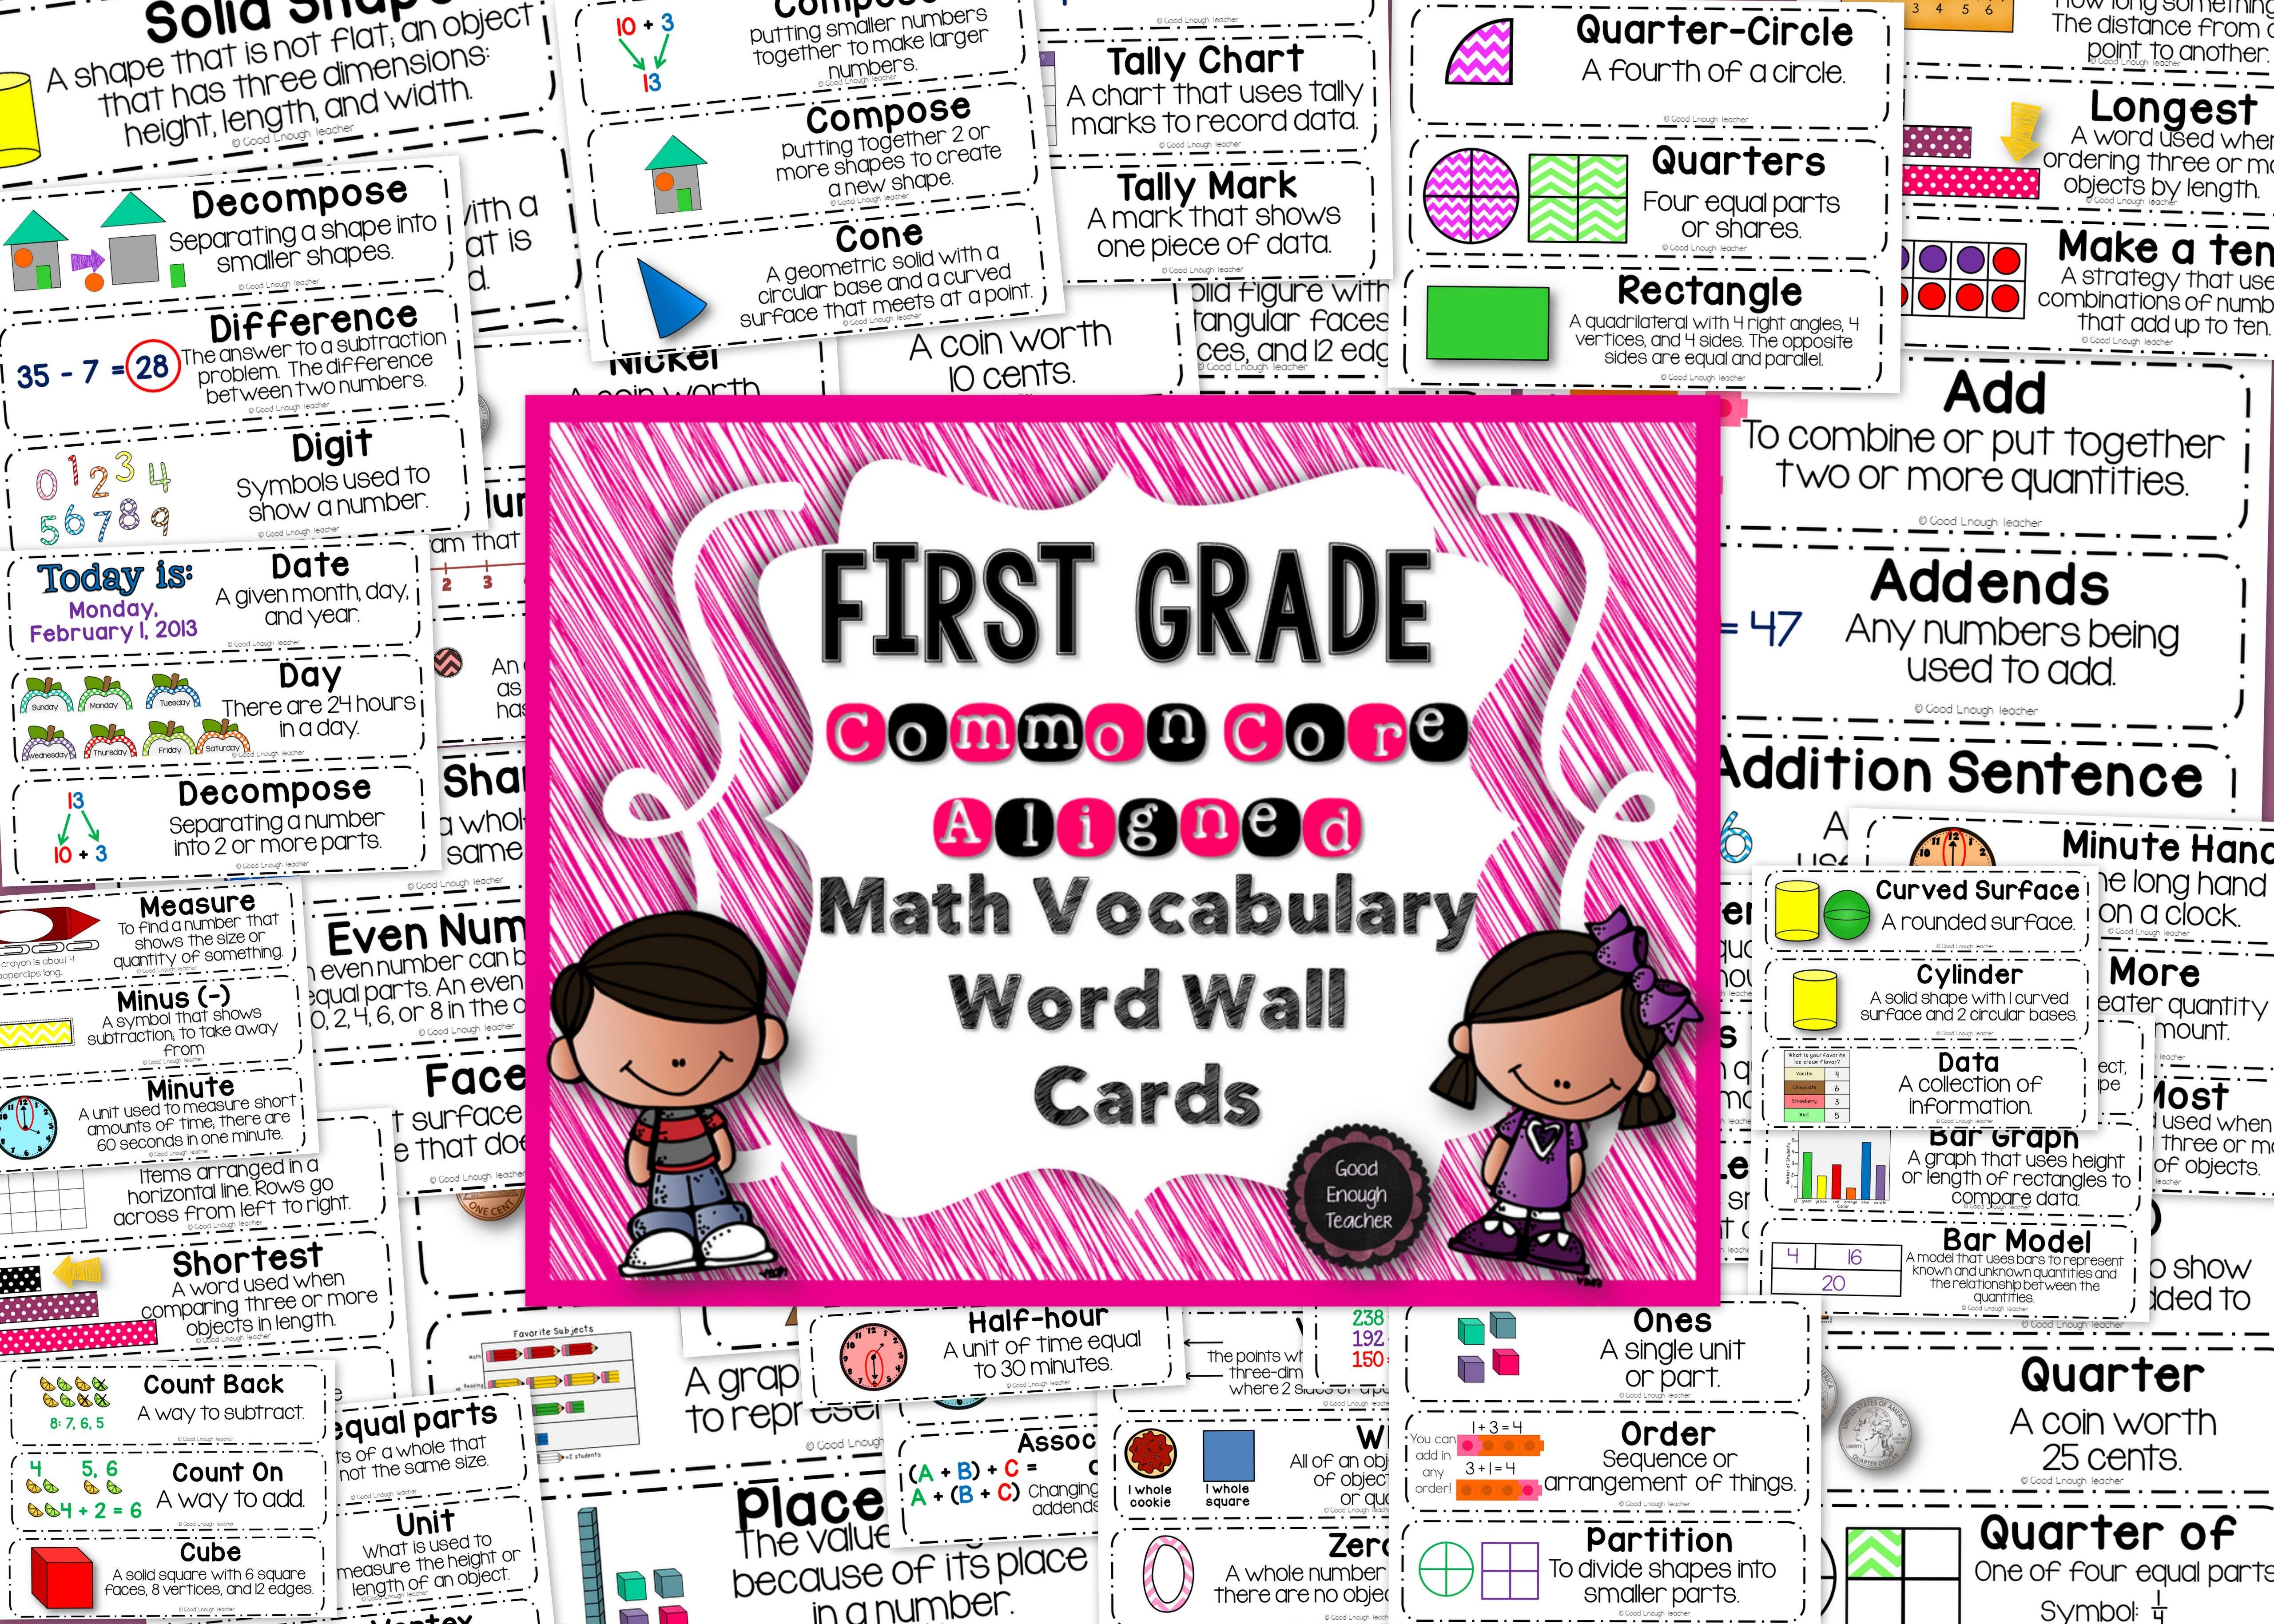 first grade ccss math vocabulary word wall cards | math vocabulary